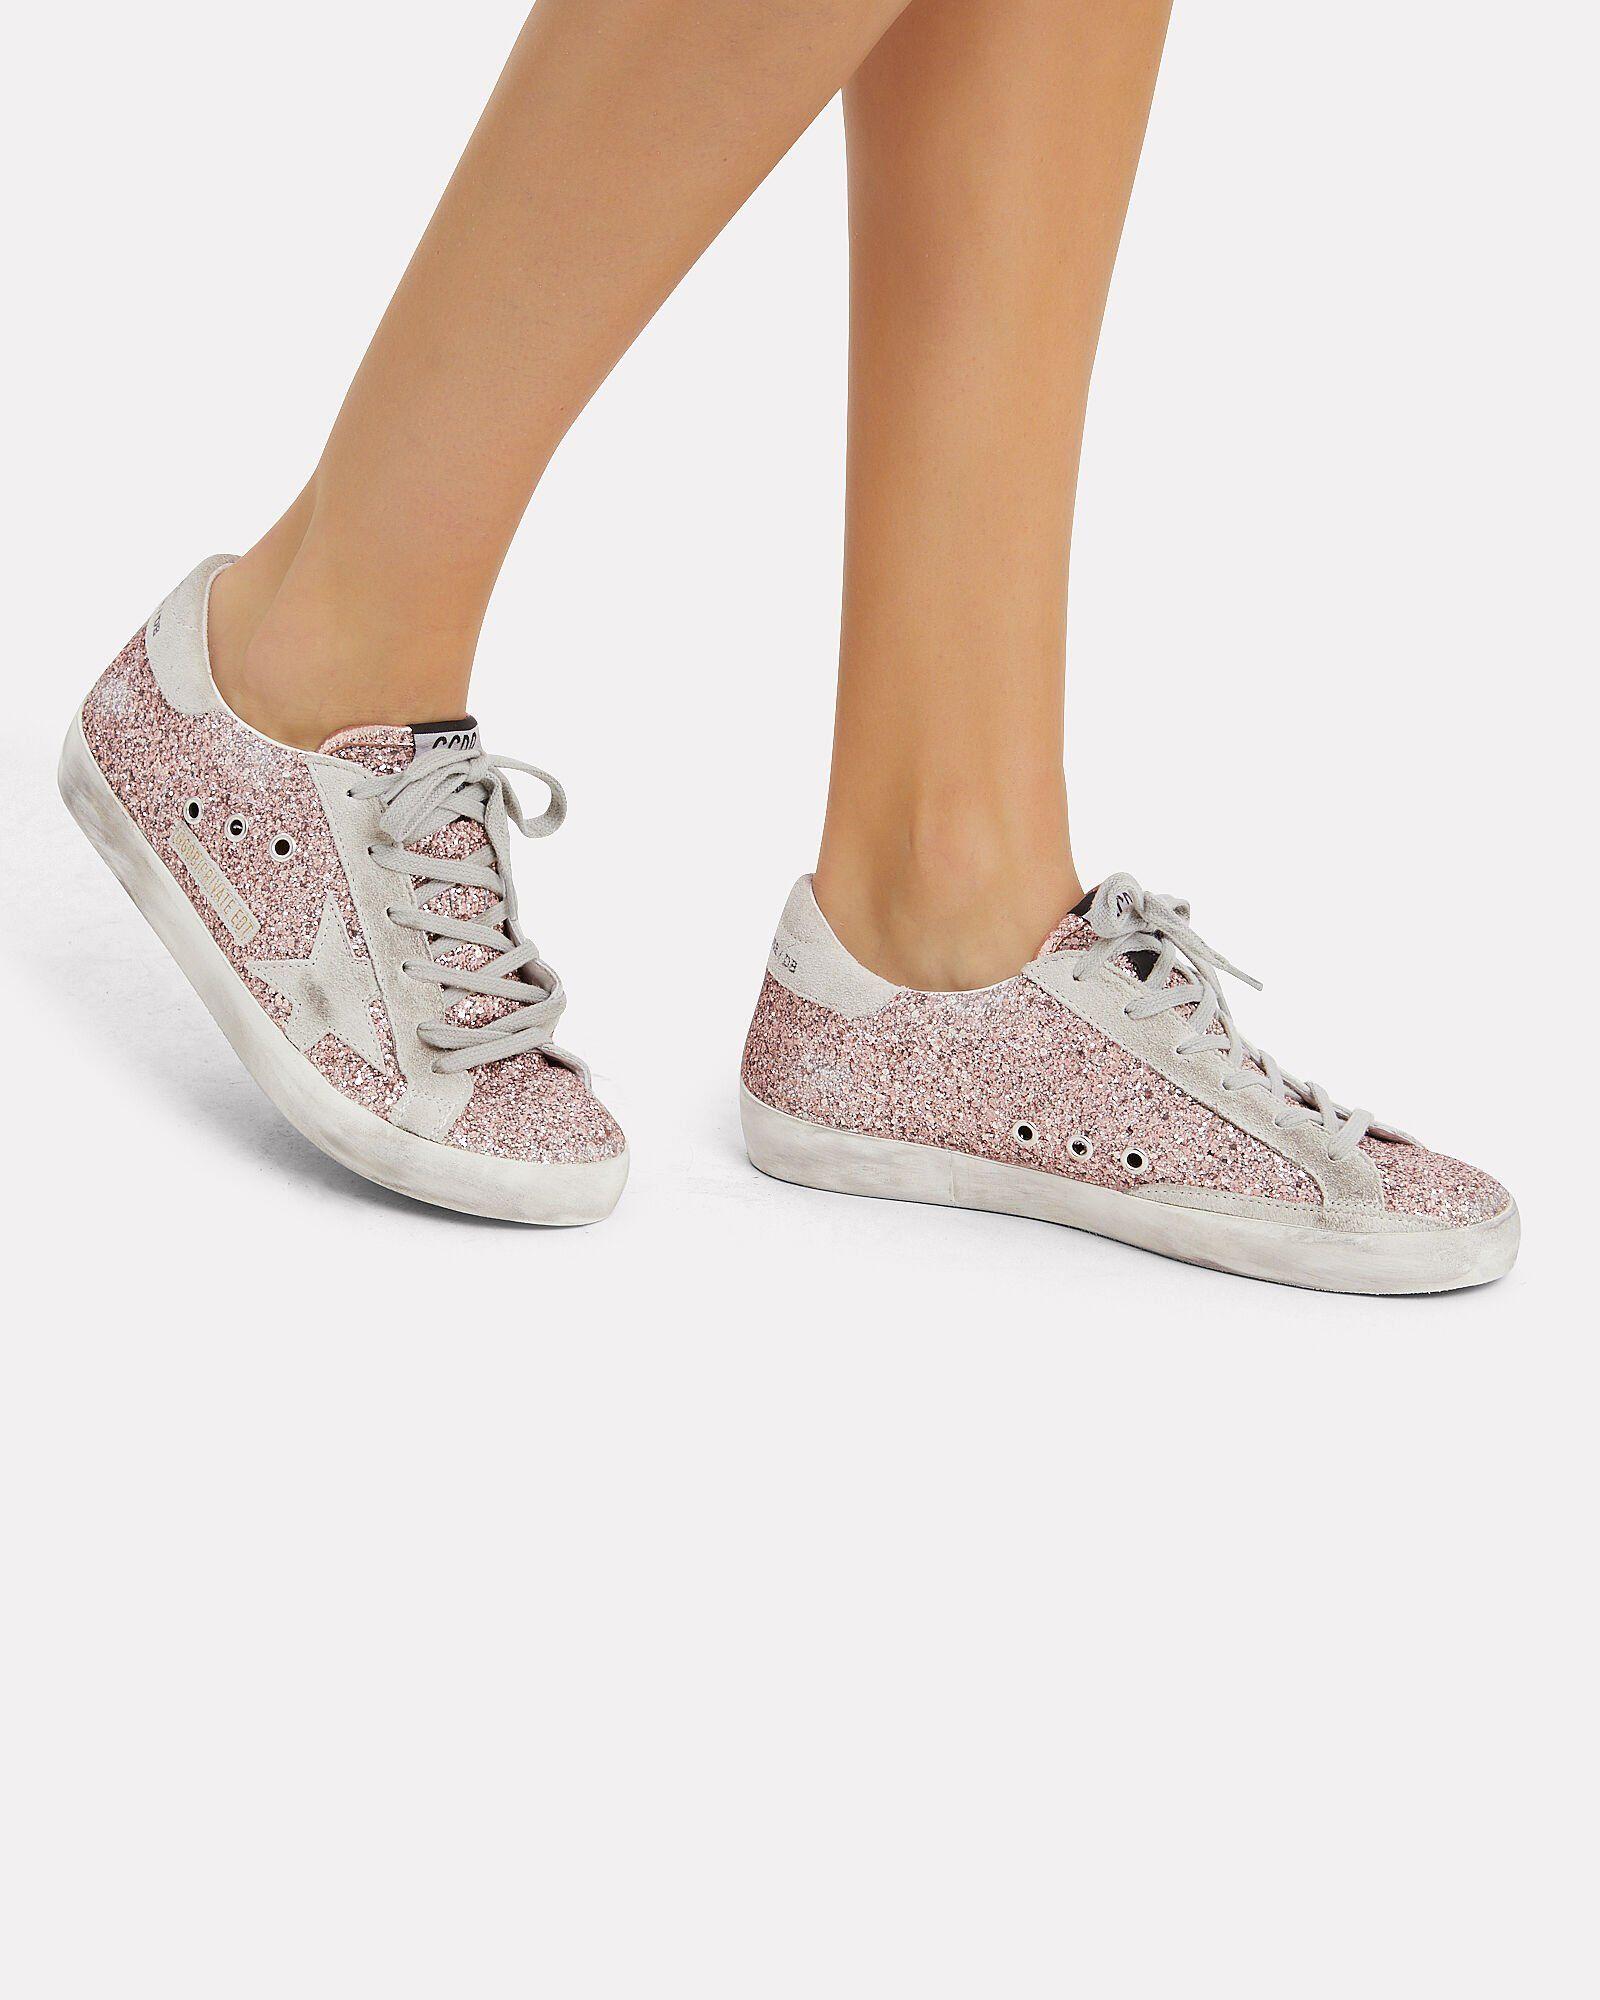 Superstar Rose Gold Glitter Sneakers in